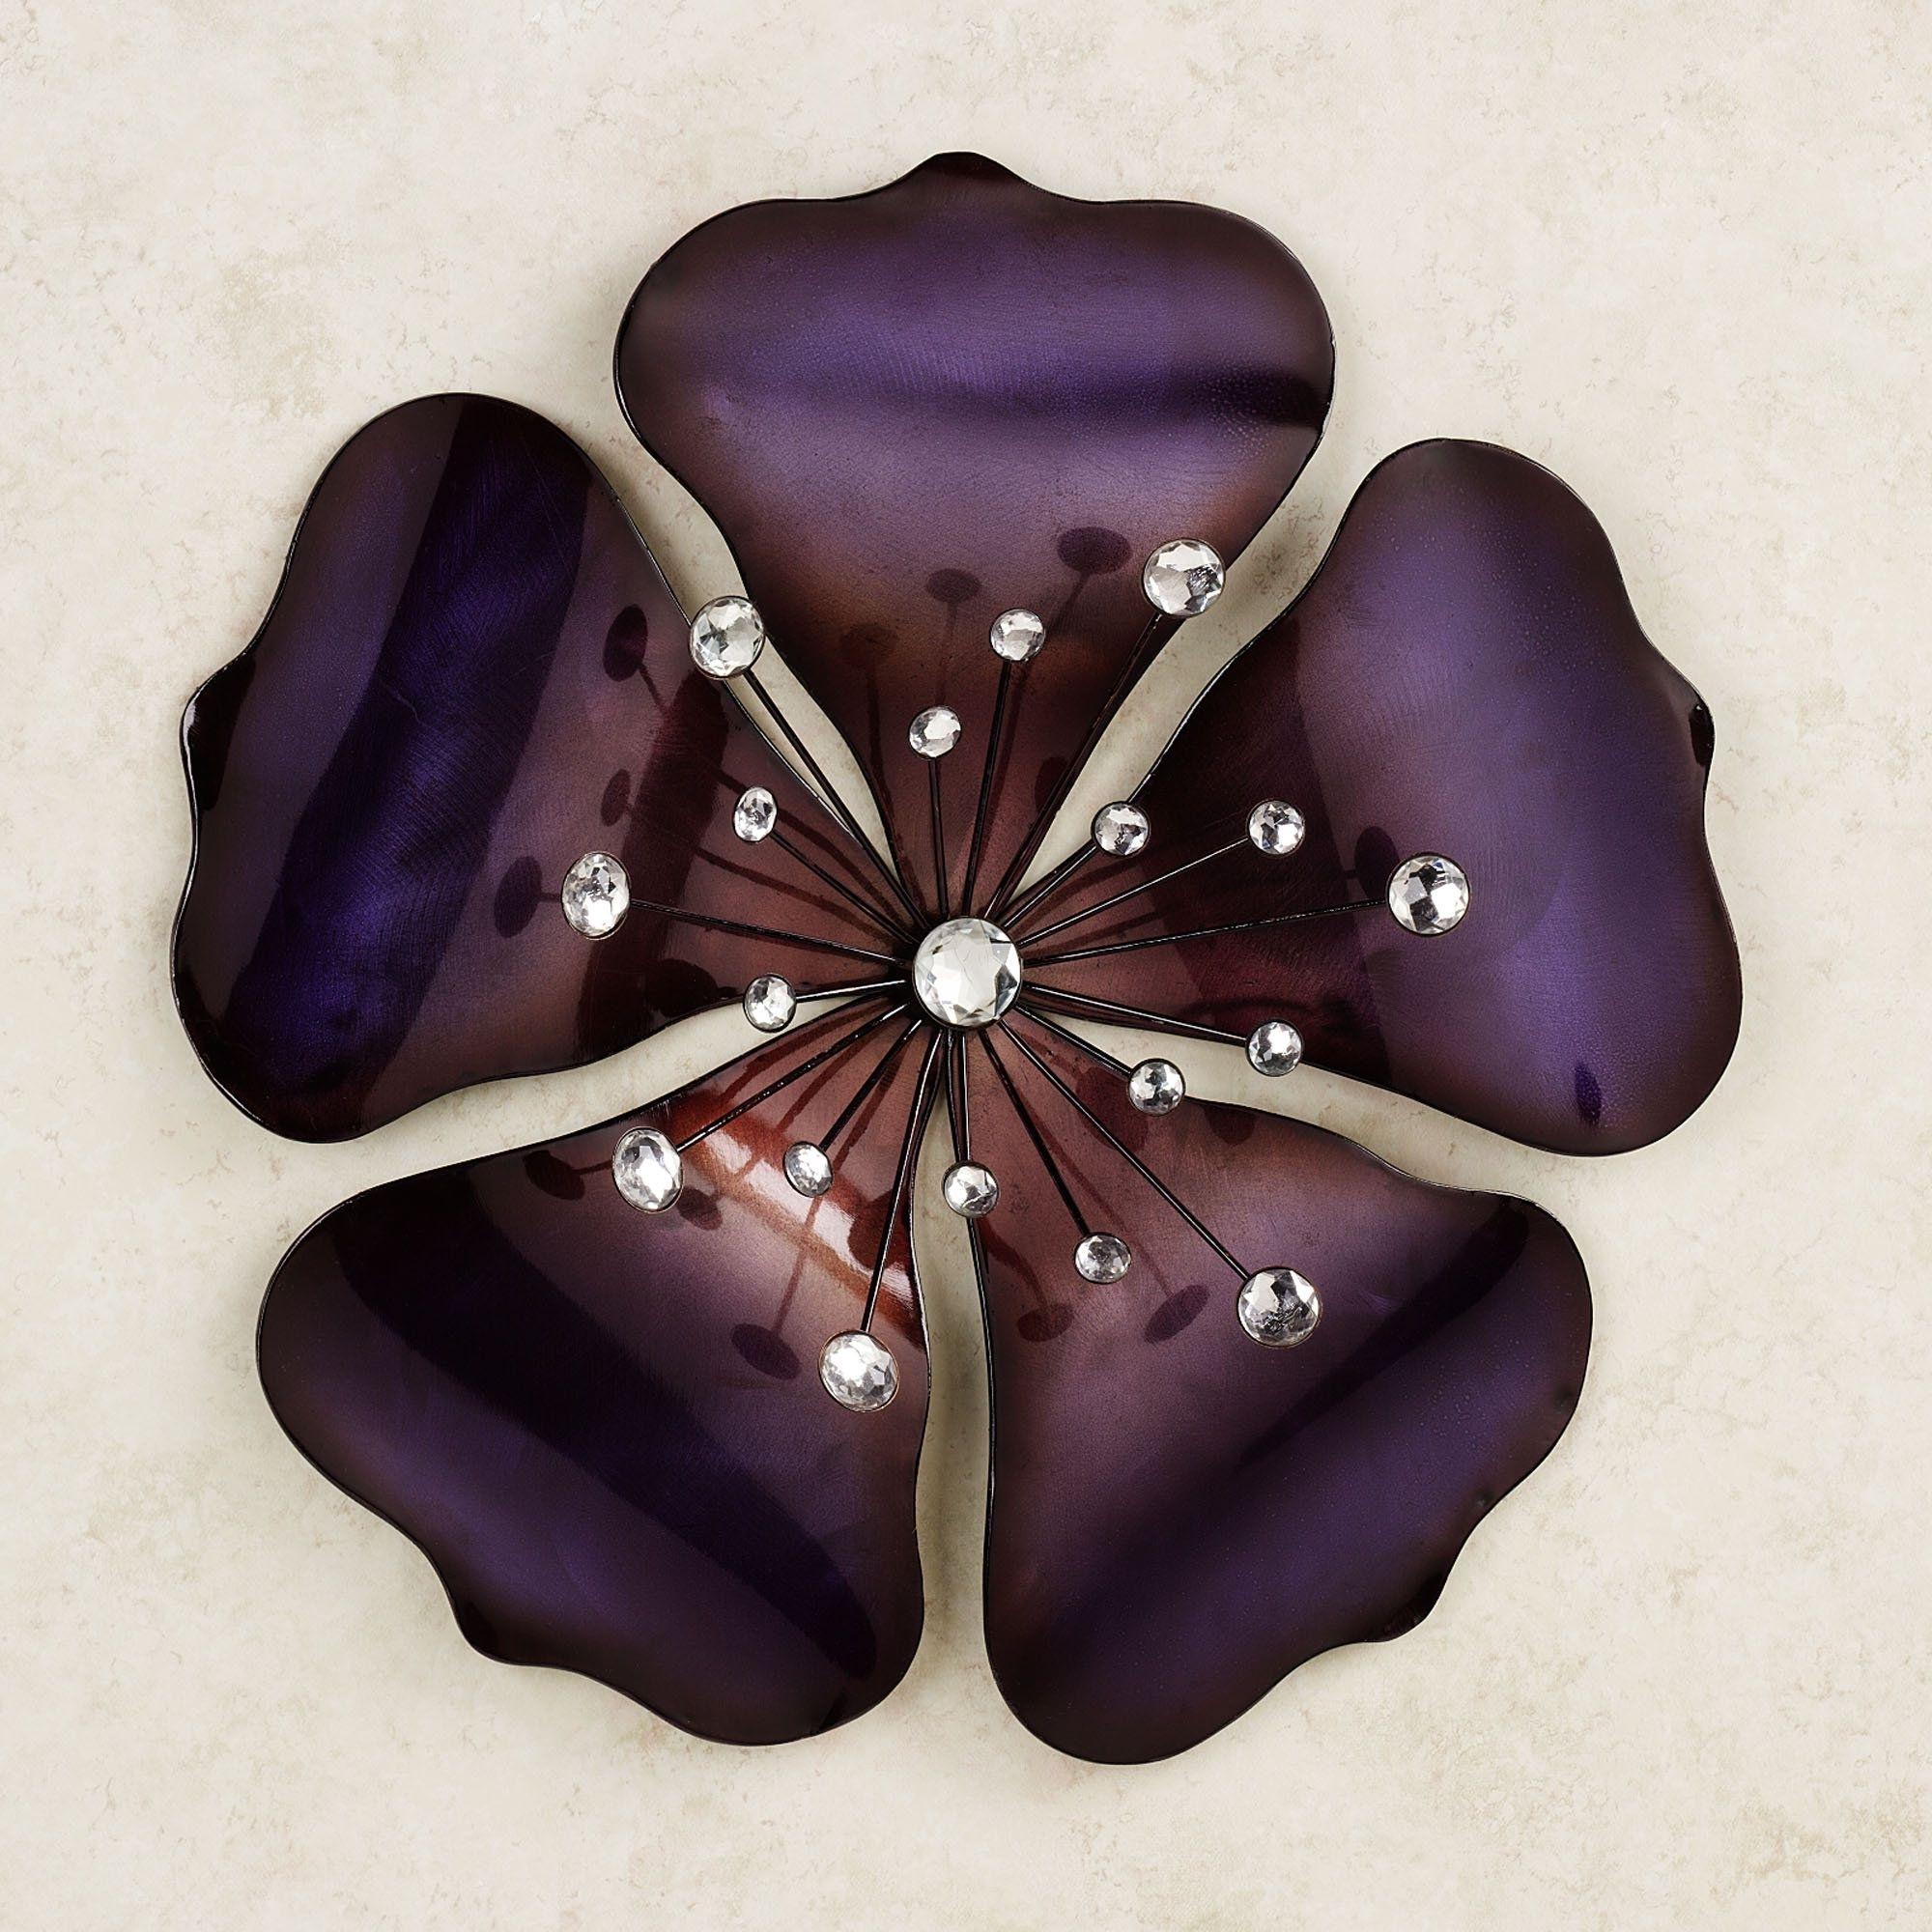 Metal Flowers Wall Art In Well Known Shimmering Gem Purple Flower Metal Wall Art (View 15 of 15)